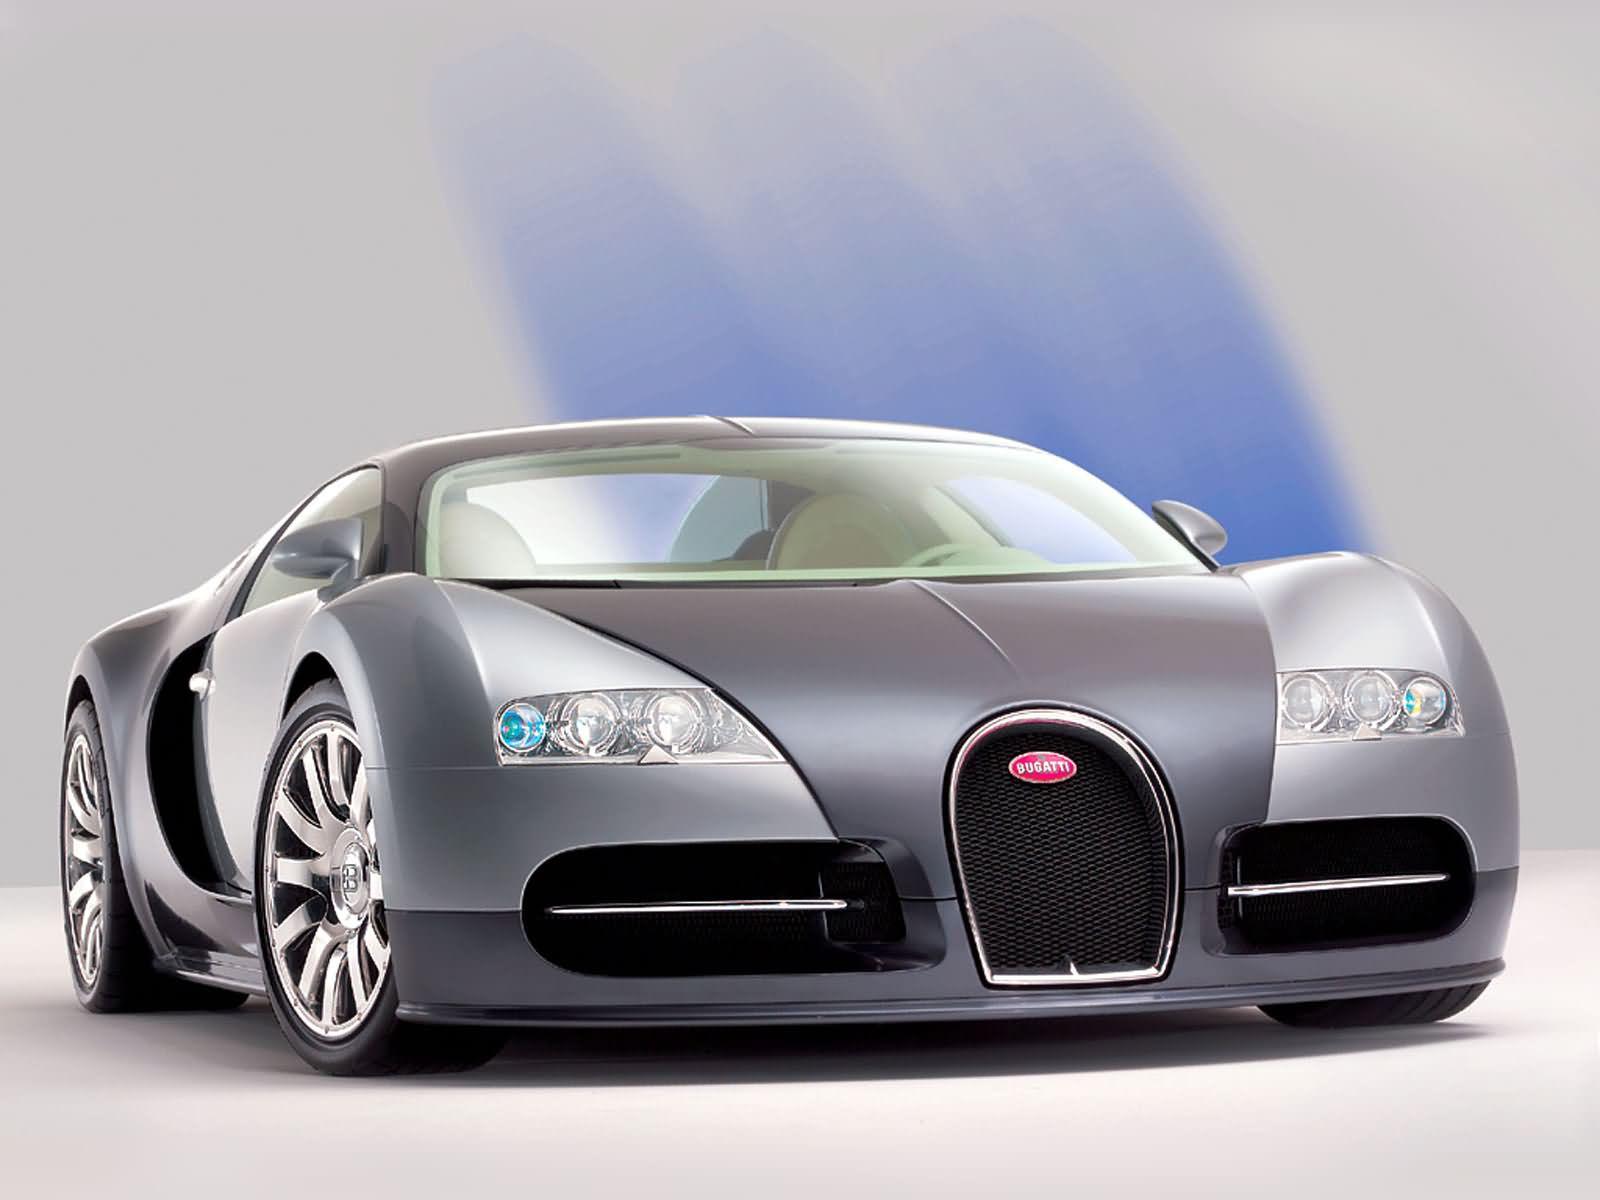 Bugatti veyron wallpaper for desktop - photo#28